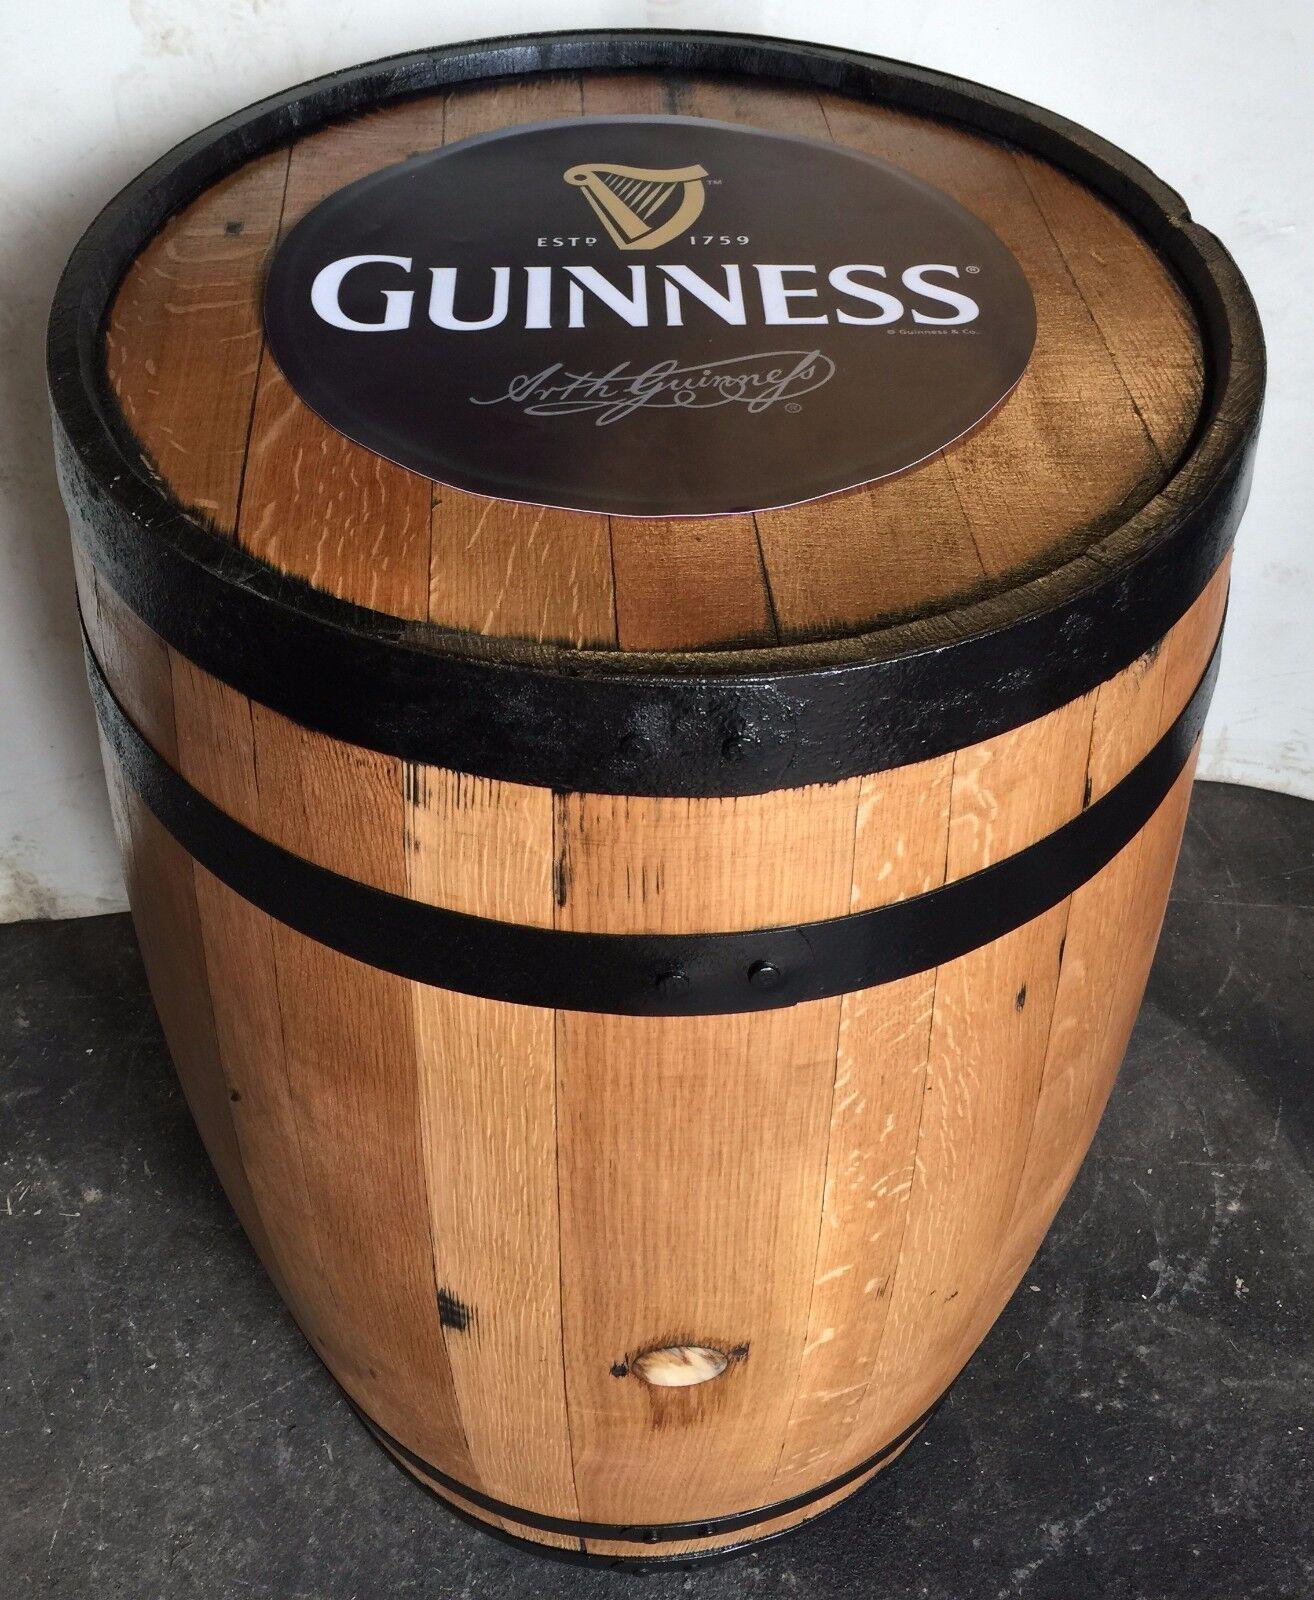 wooden beer barrel chairs korum fishing chair reviews refurbished guinness solid oak original patio